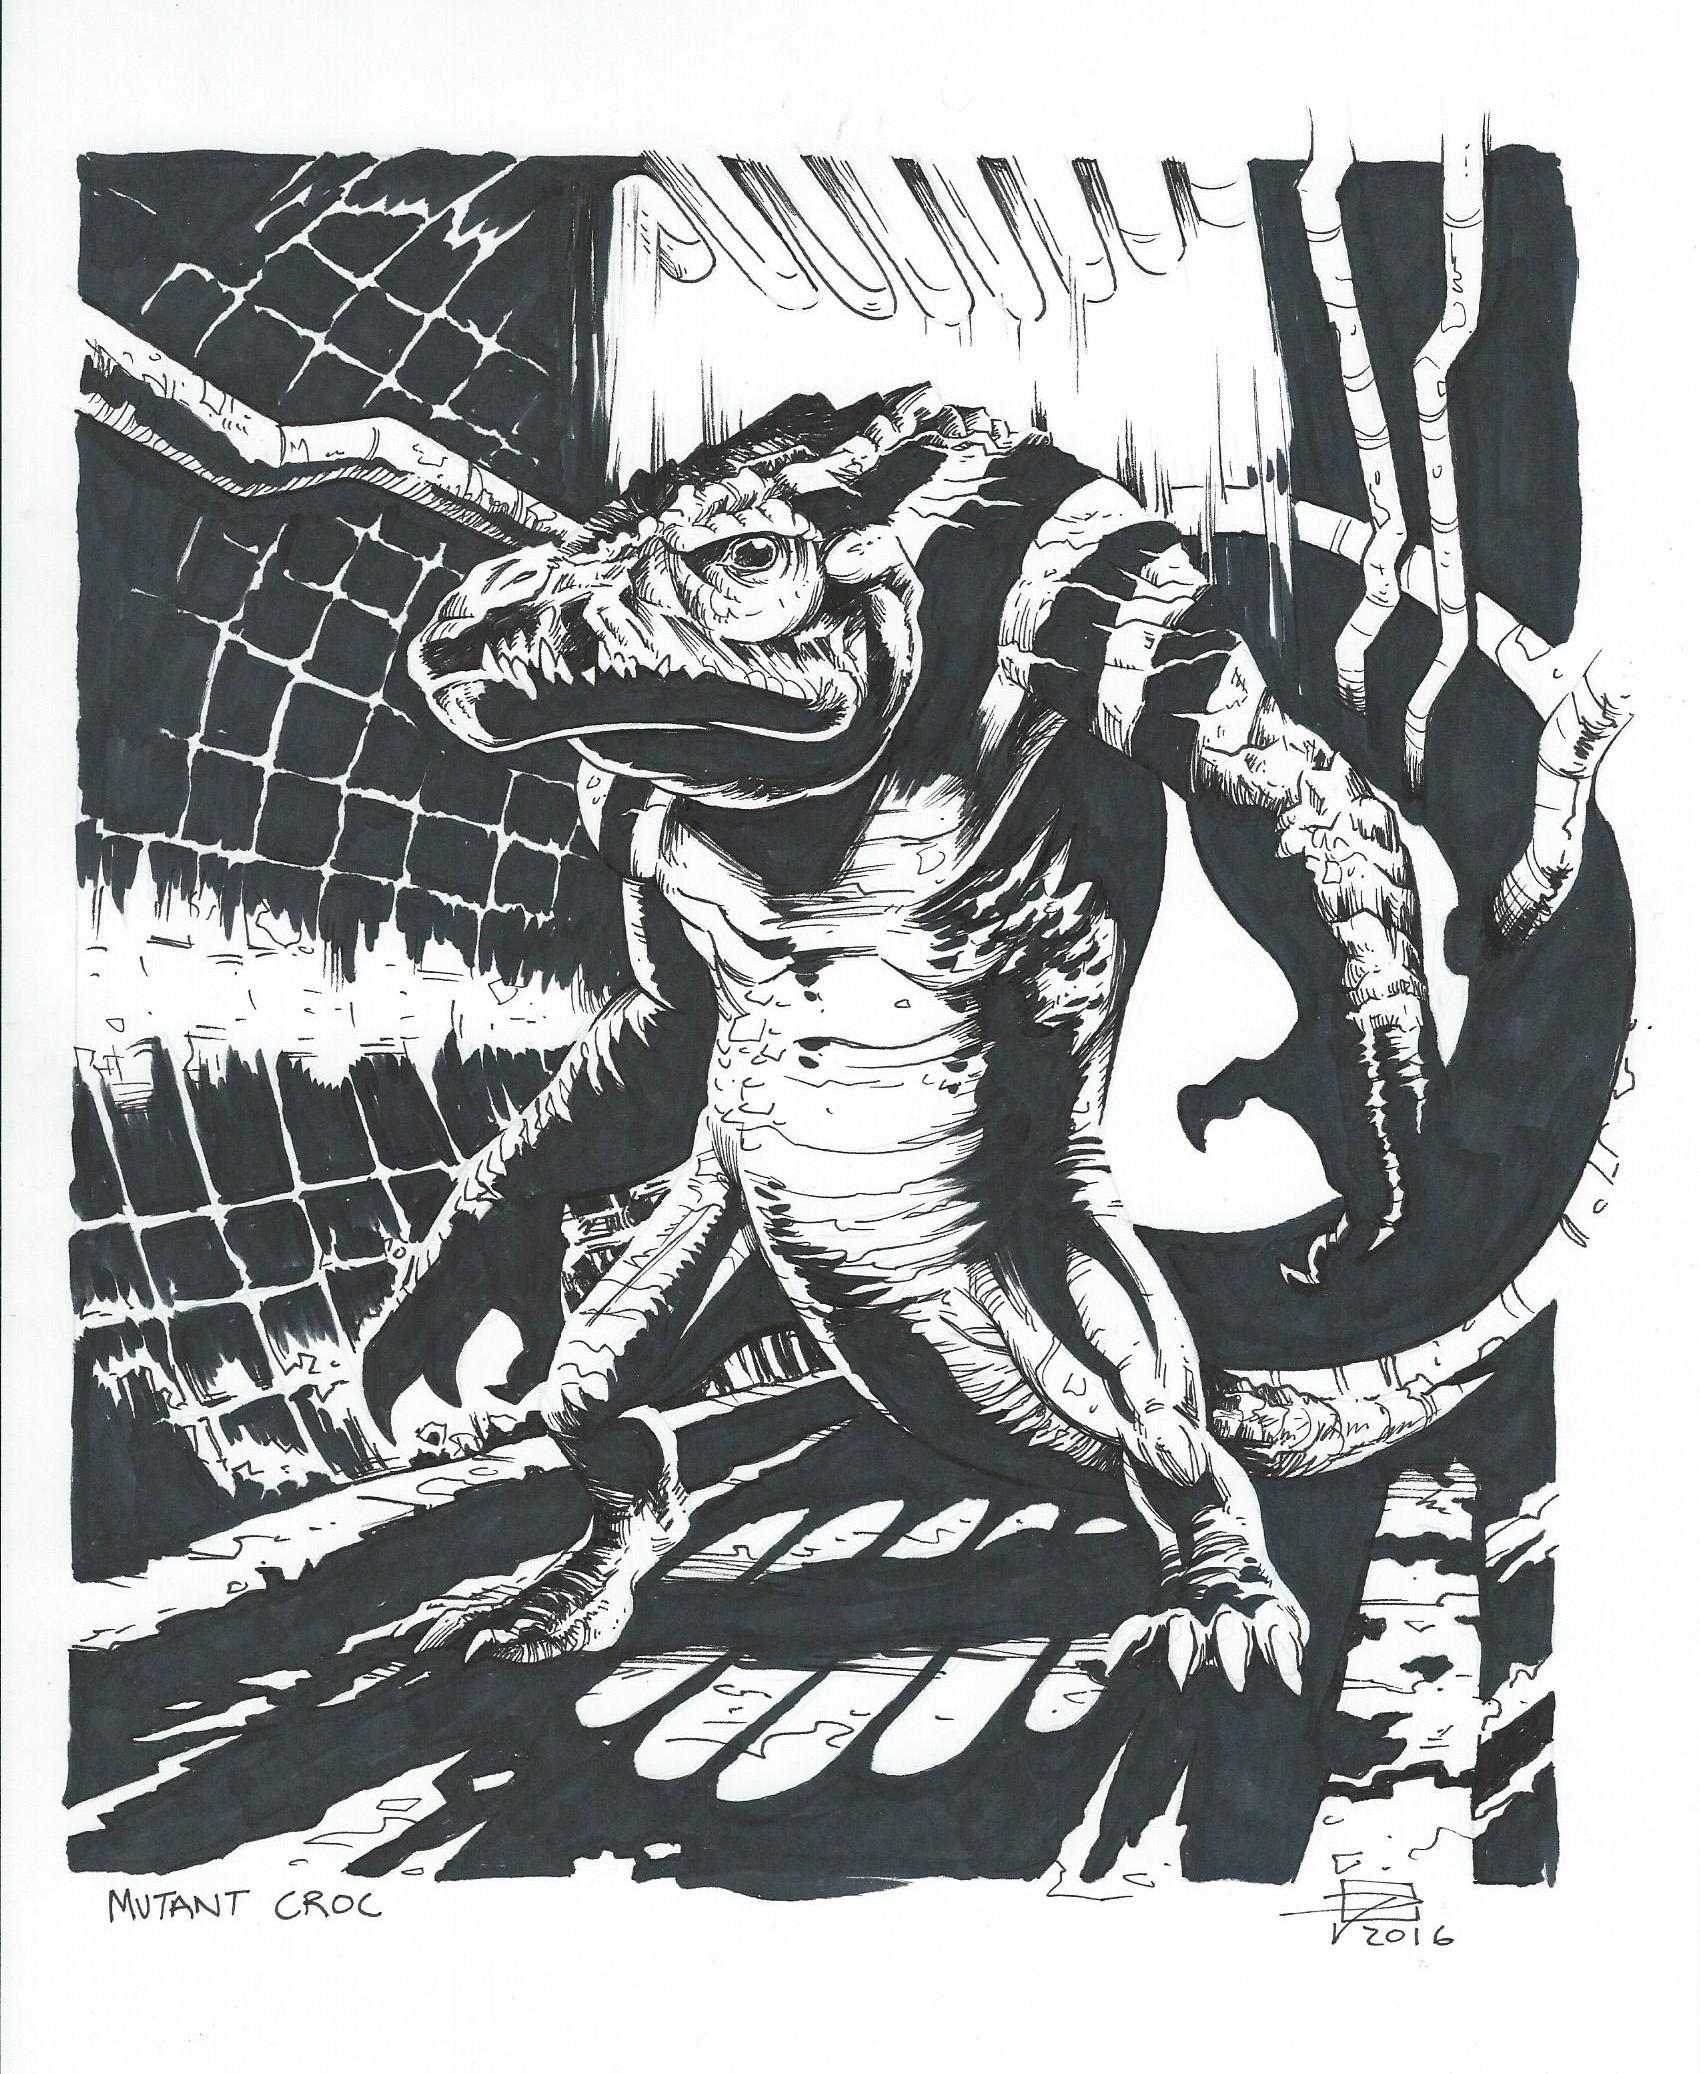 Mutant Croc - Inktober 2016